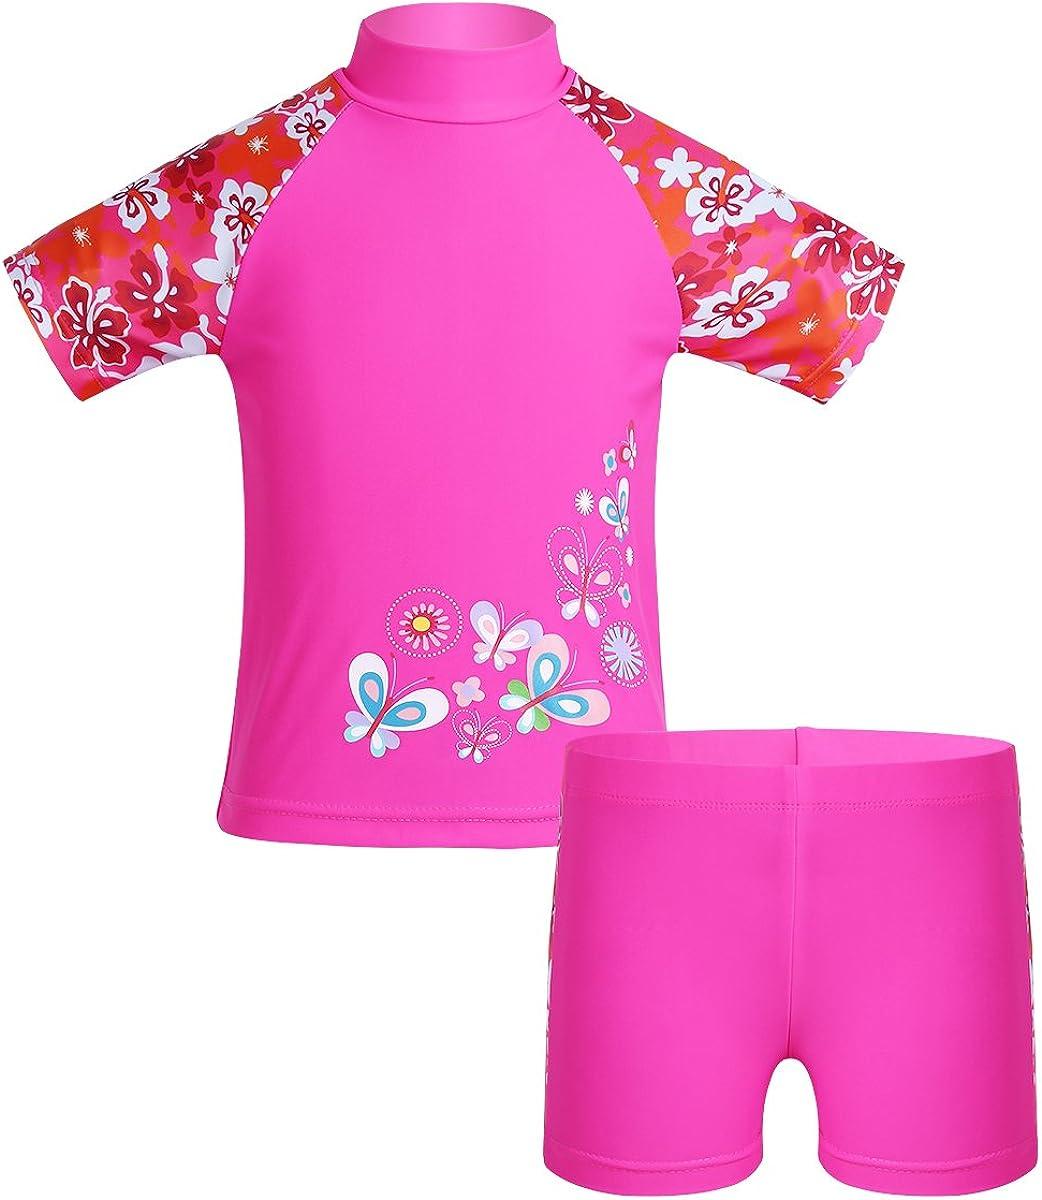 CHICTRY Girls' Floral Print 2-Piece Short Guard Rash Sleeve Tank Cheap SALE Start Weekly update